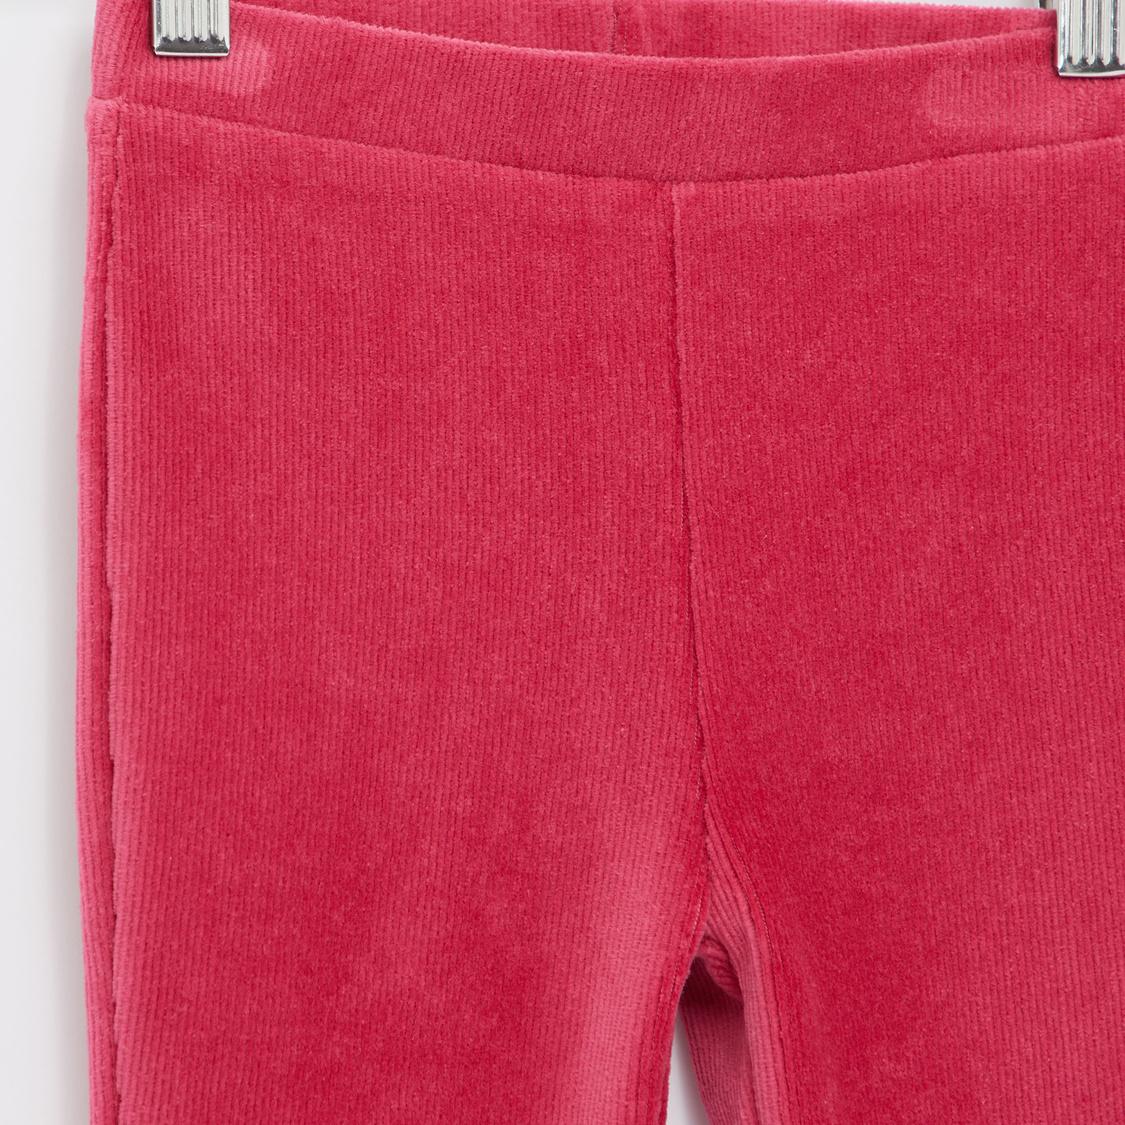 Full Length Textured Leggings with Elasticised Waistband